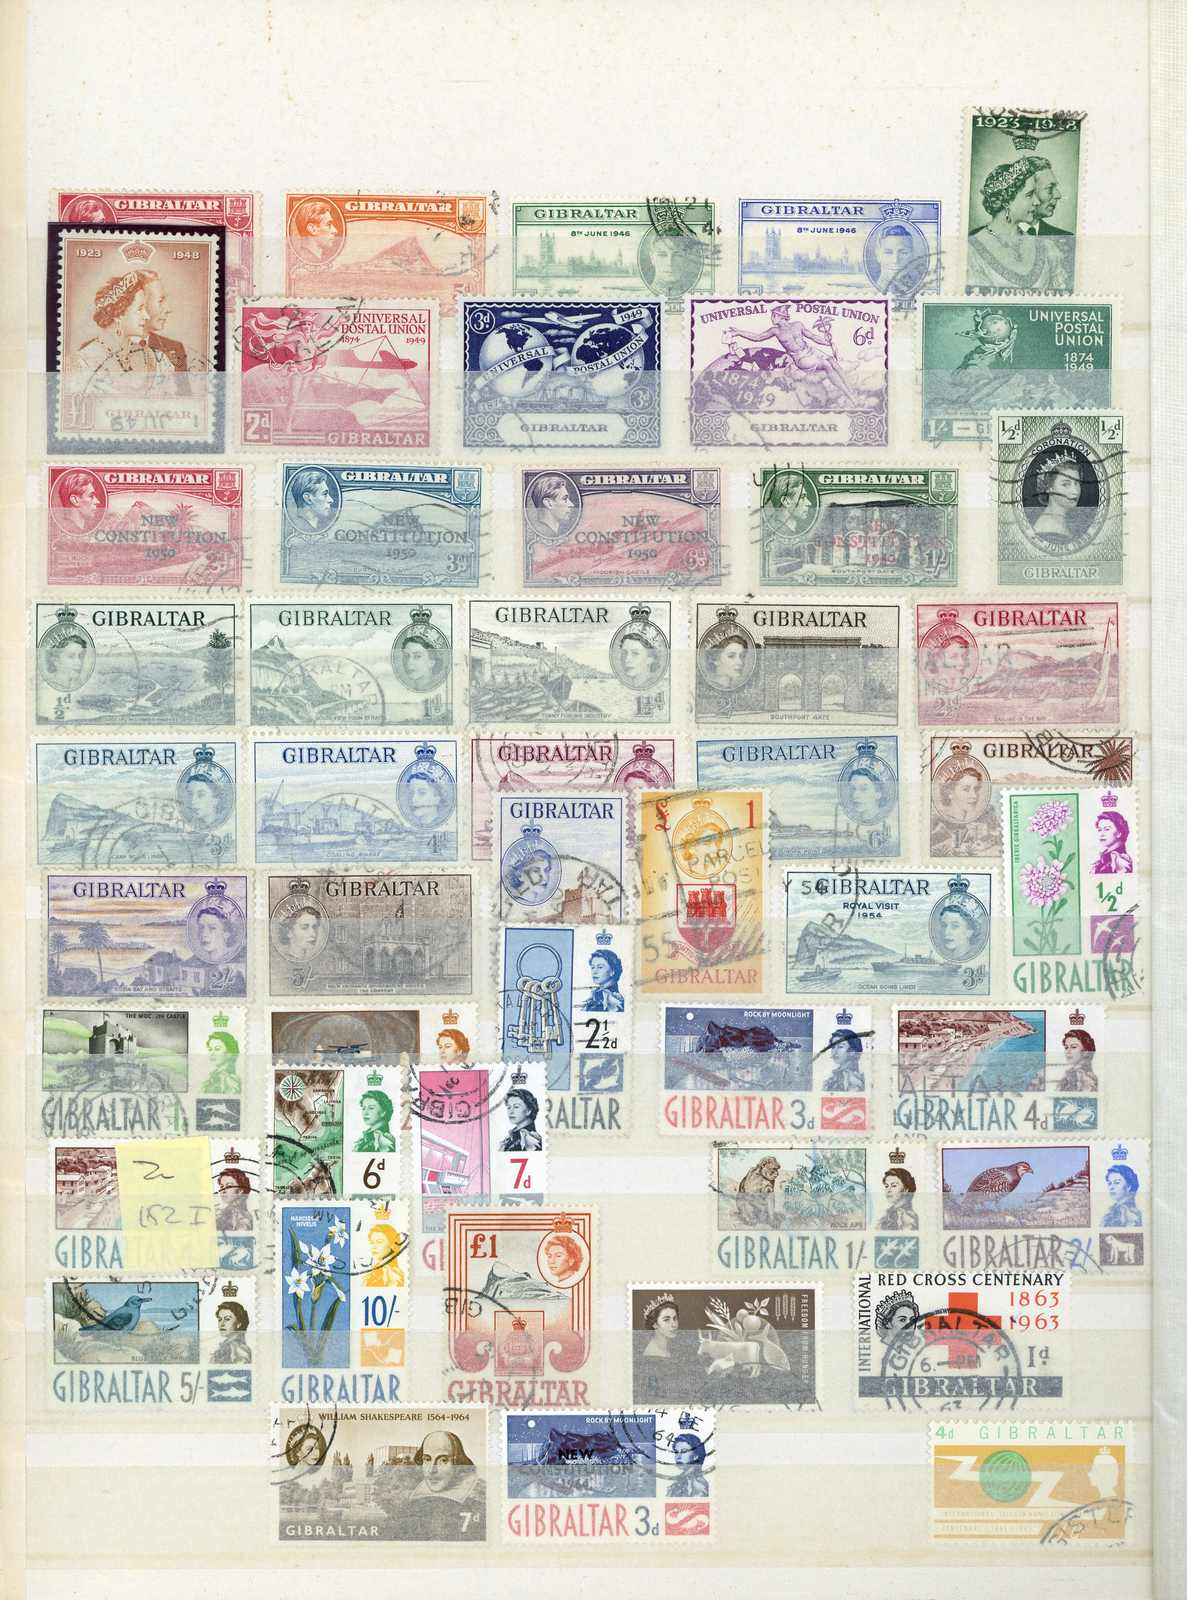 Lot 2326 - COLLECTIONS & ACCUMULATIONS Gibraltar -  Auktionshaus Schlegel 26 Public Auction